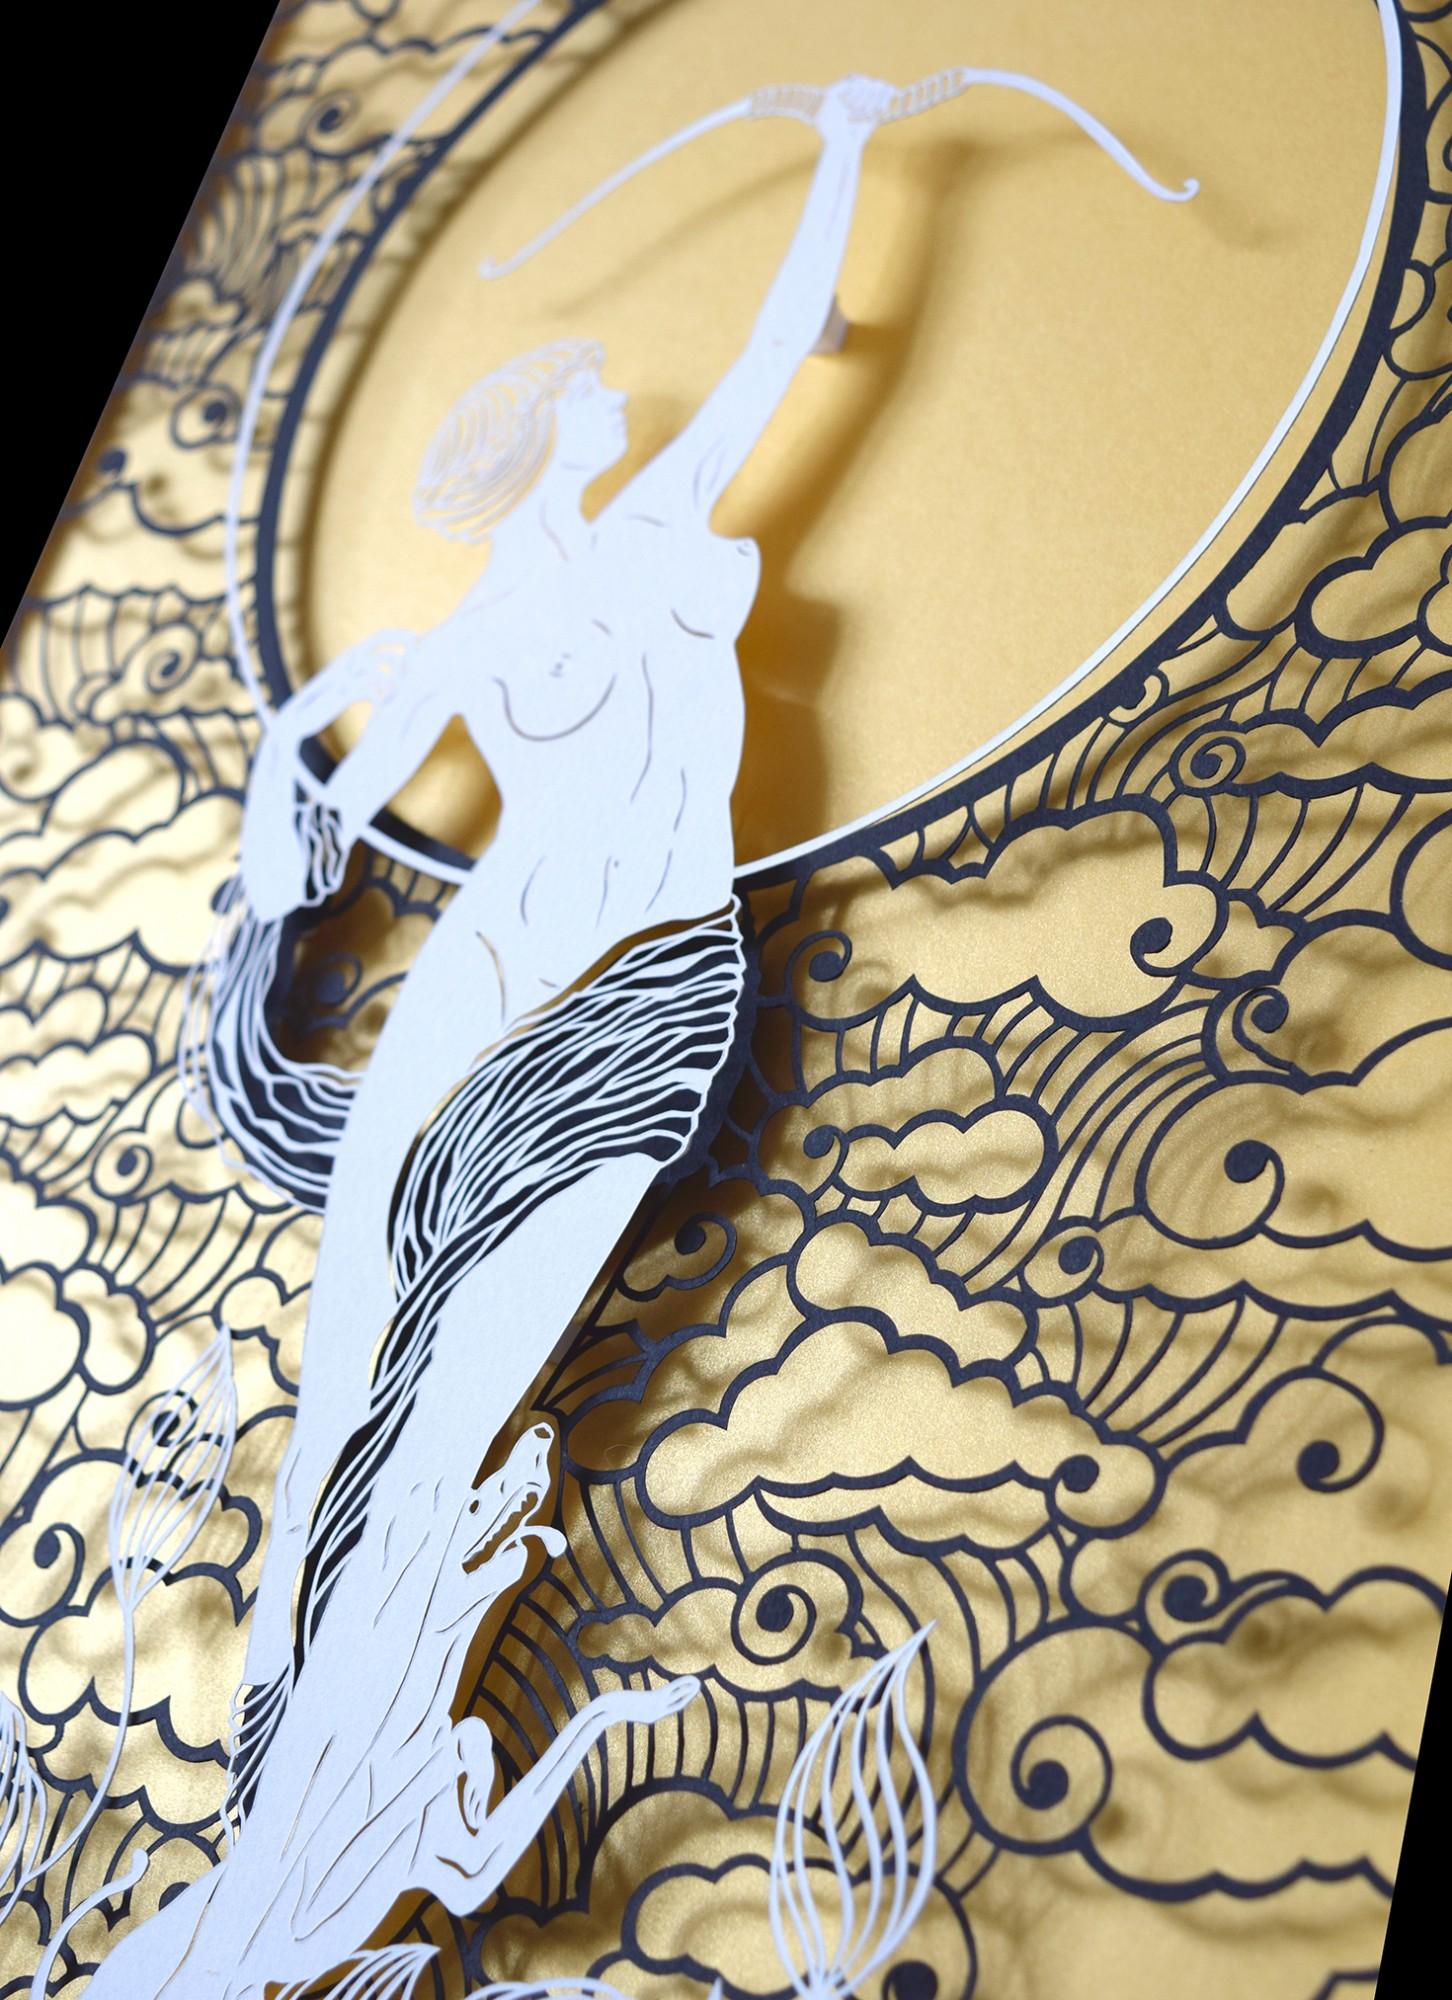 Sam-Jehanzeb_Artemis-Papercut_detail